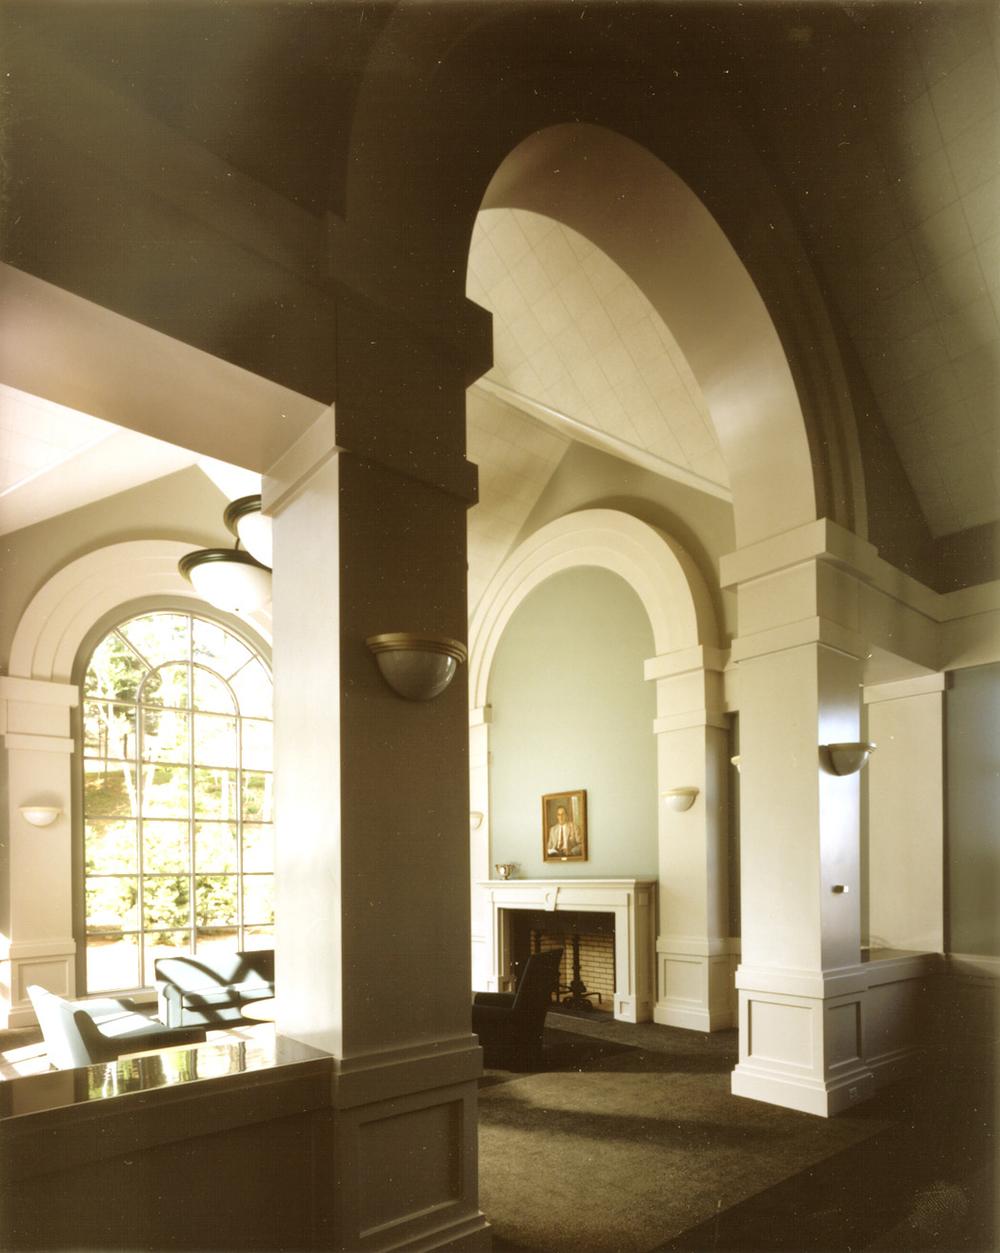 K 12 education portfolio imagine red - Sheffield school of interior design ...